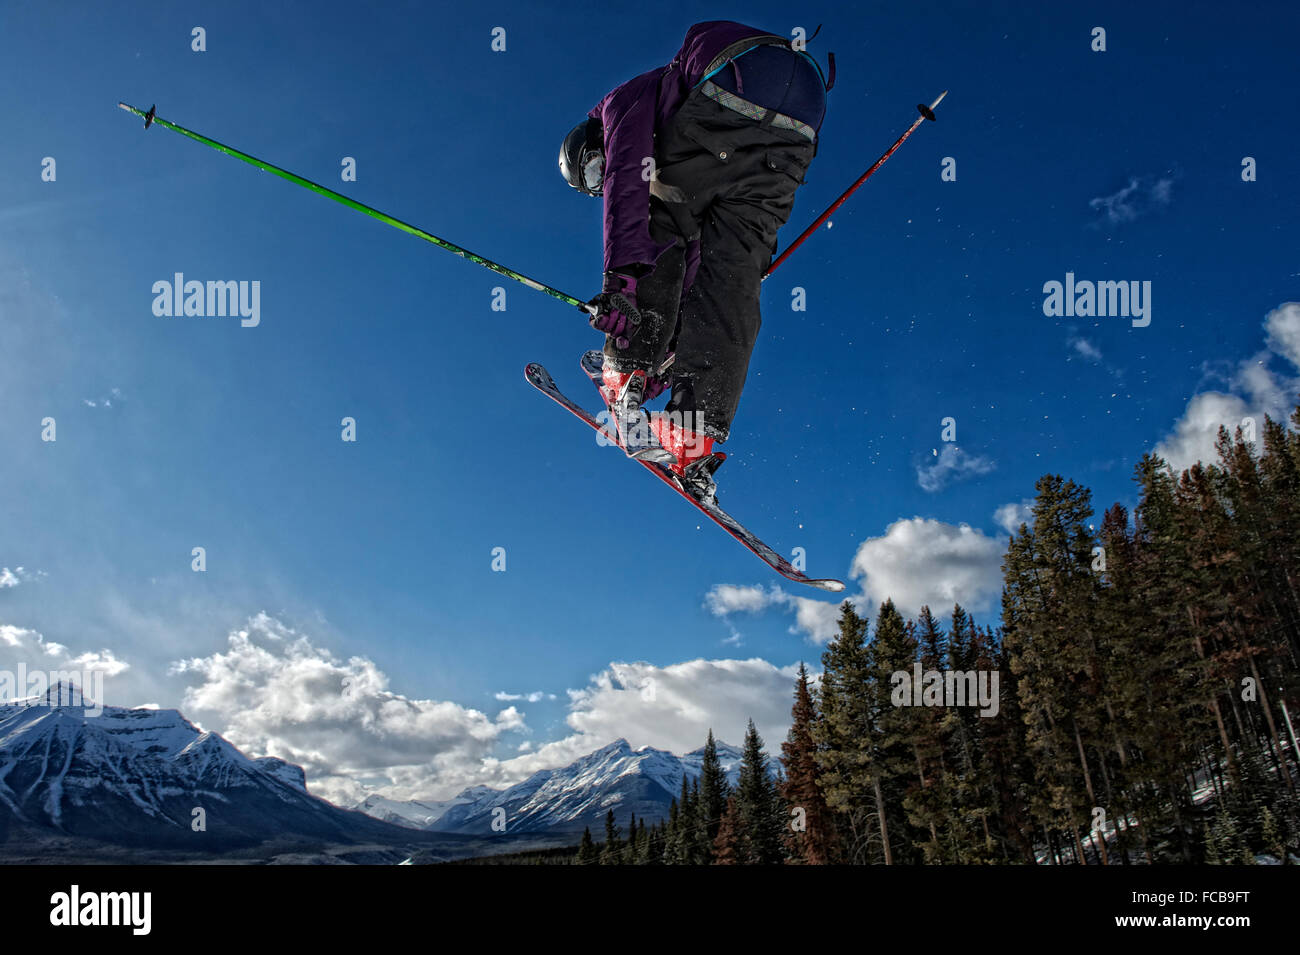 A skier flies high above the ski run at Lake Louise Ski Resort, Canada - Stock Image